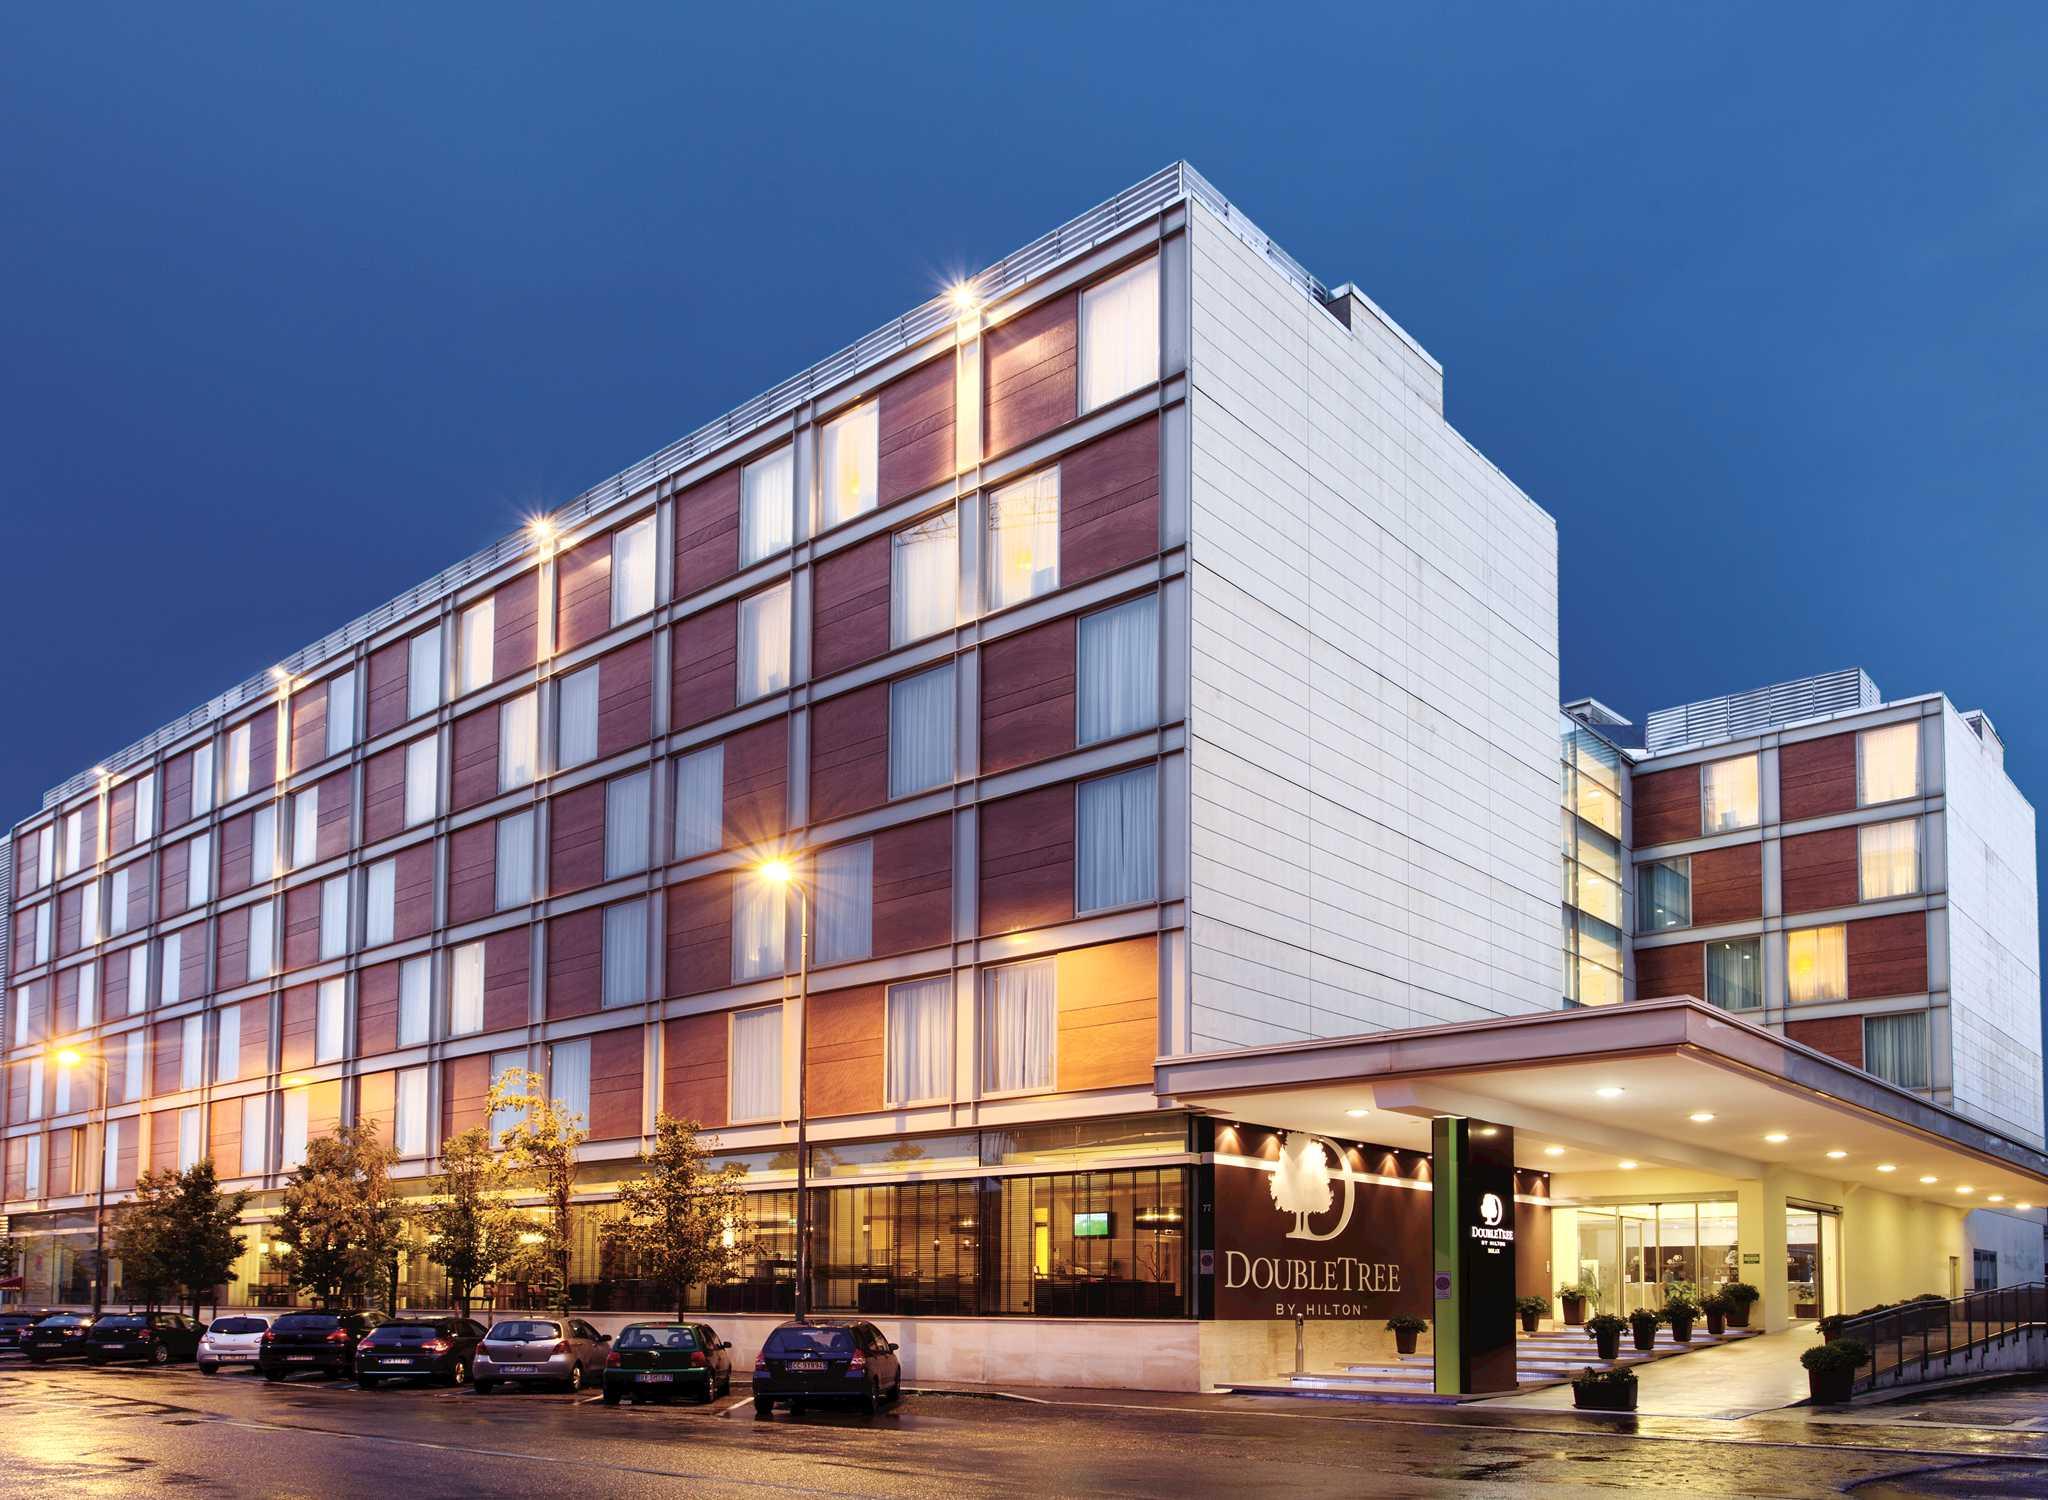 Hilton hotels resorts italie for Hotel milan